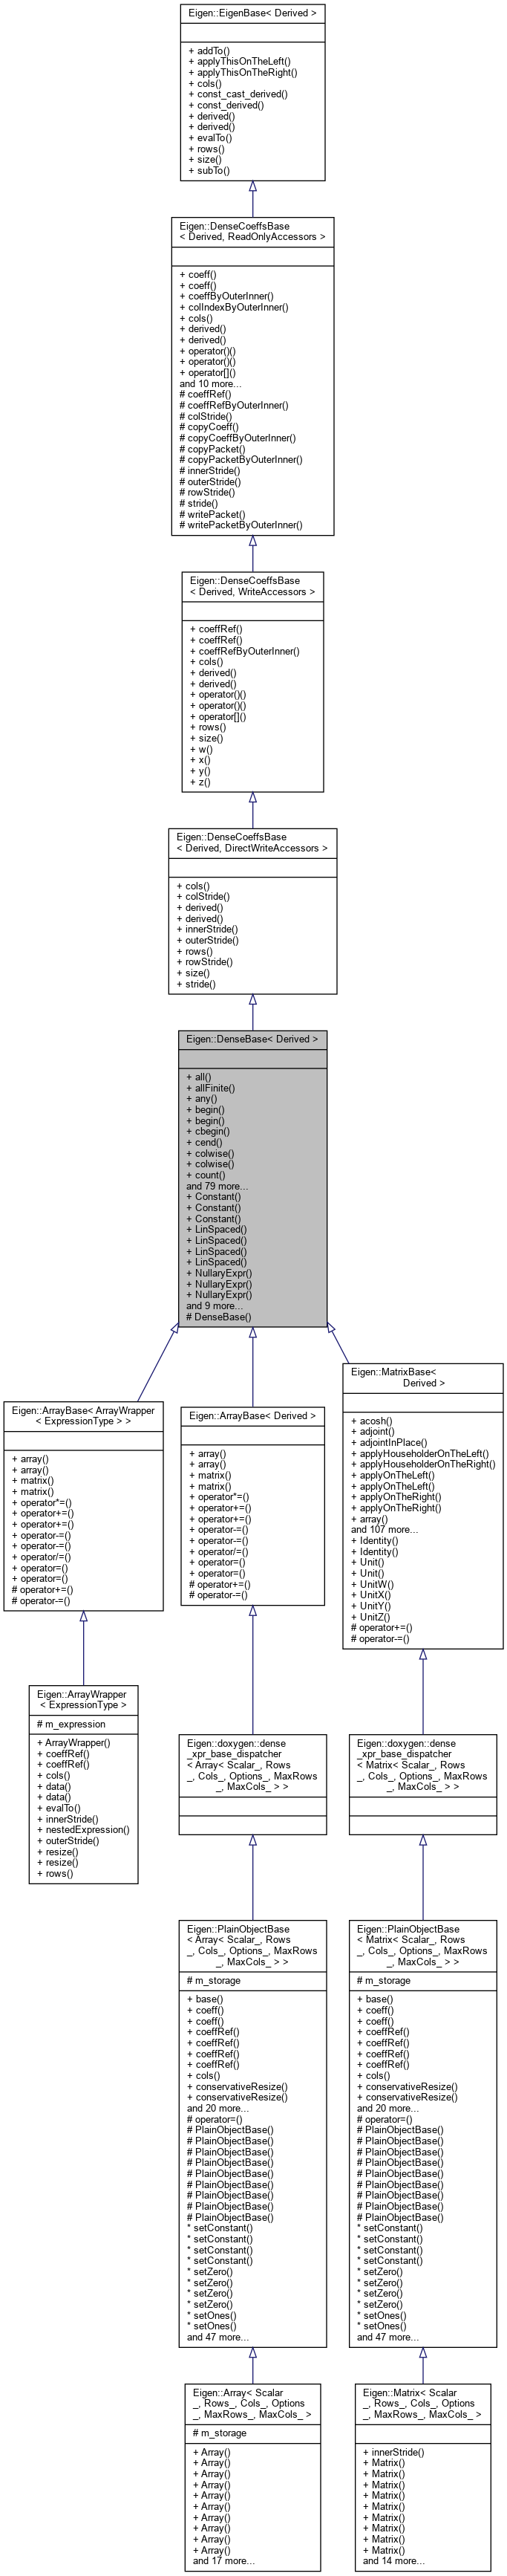 medium resolution of inheritance graph